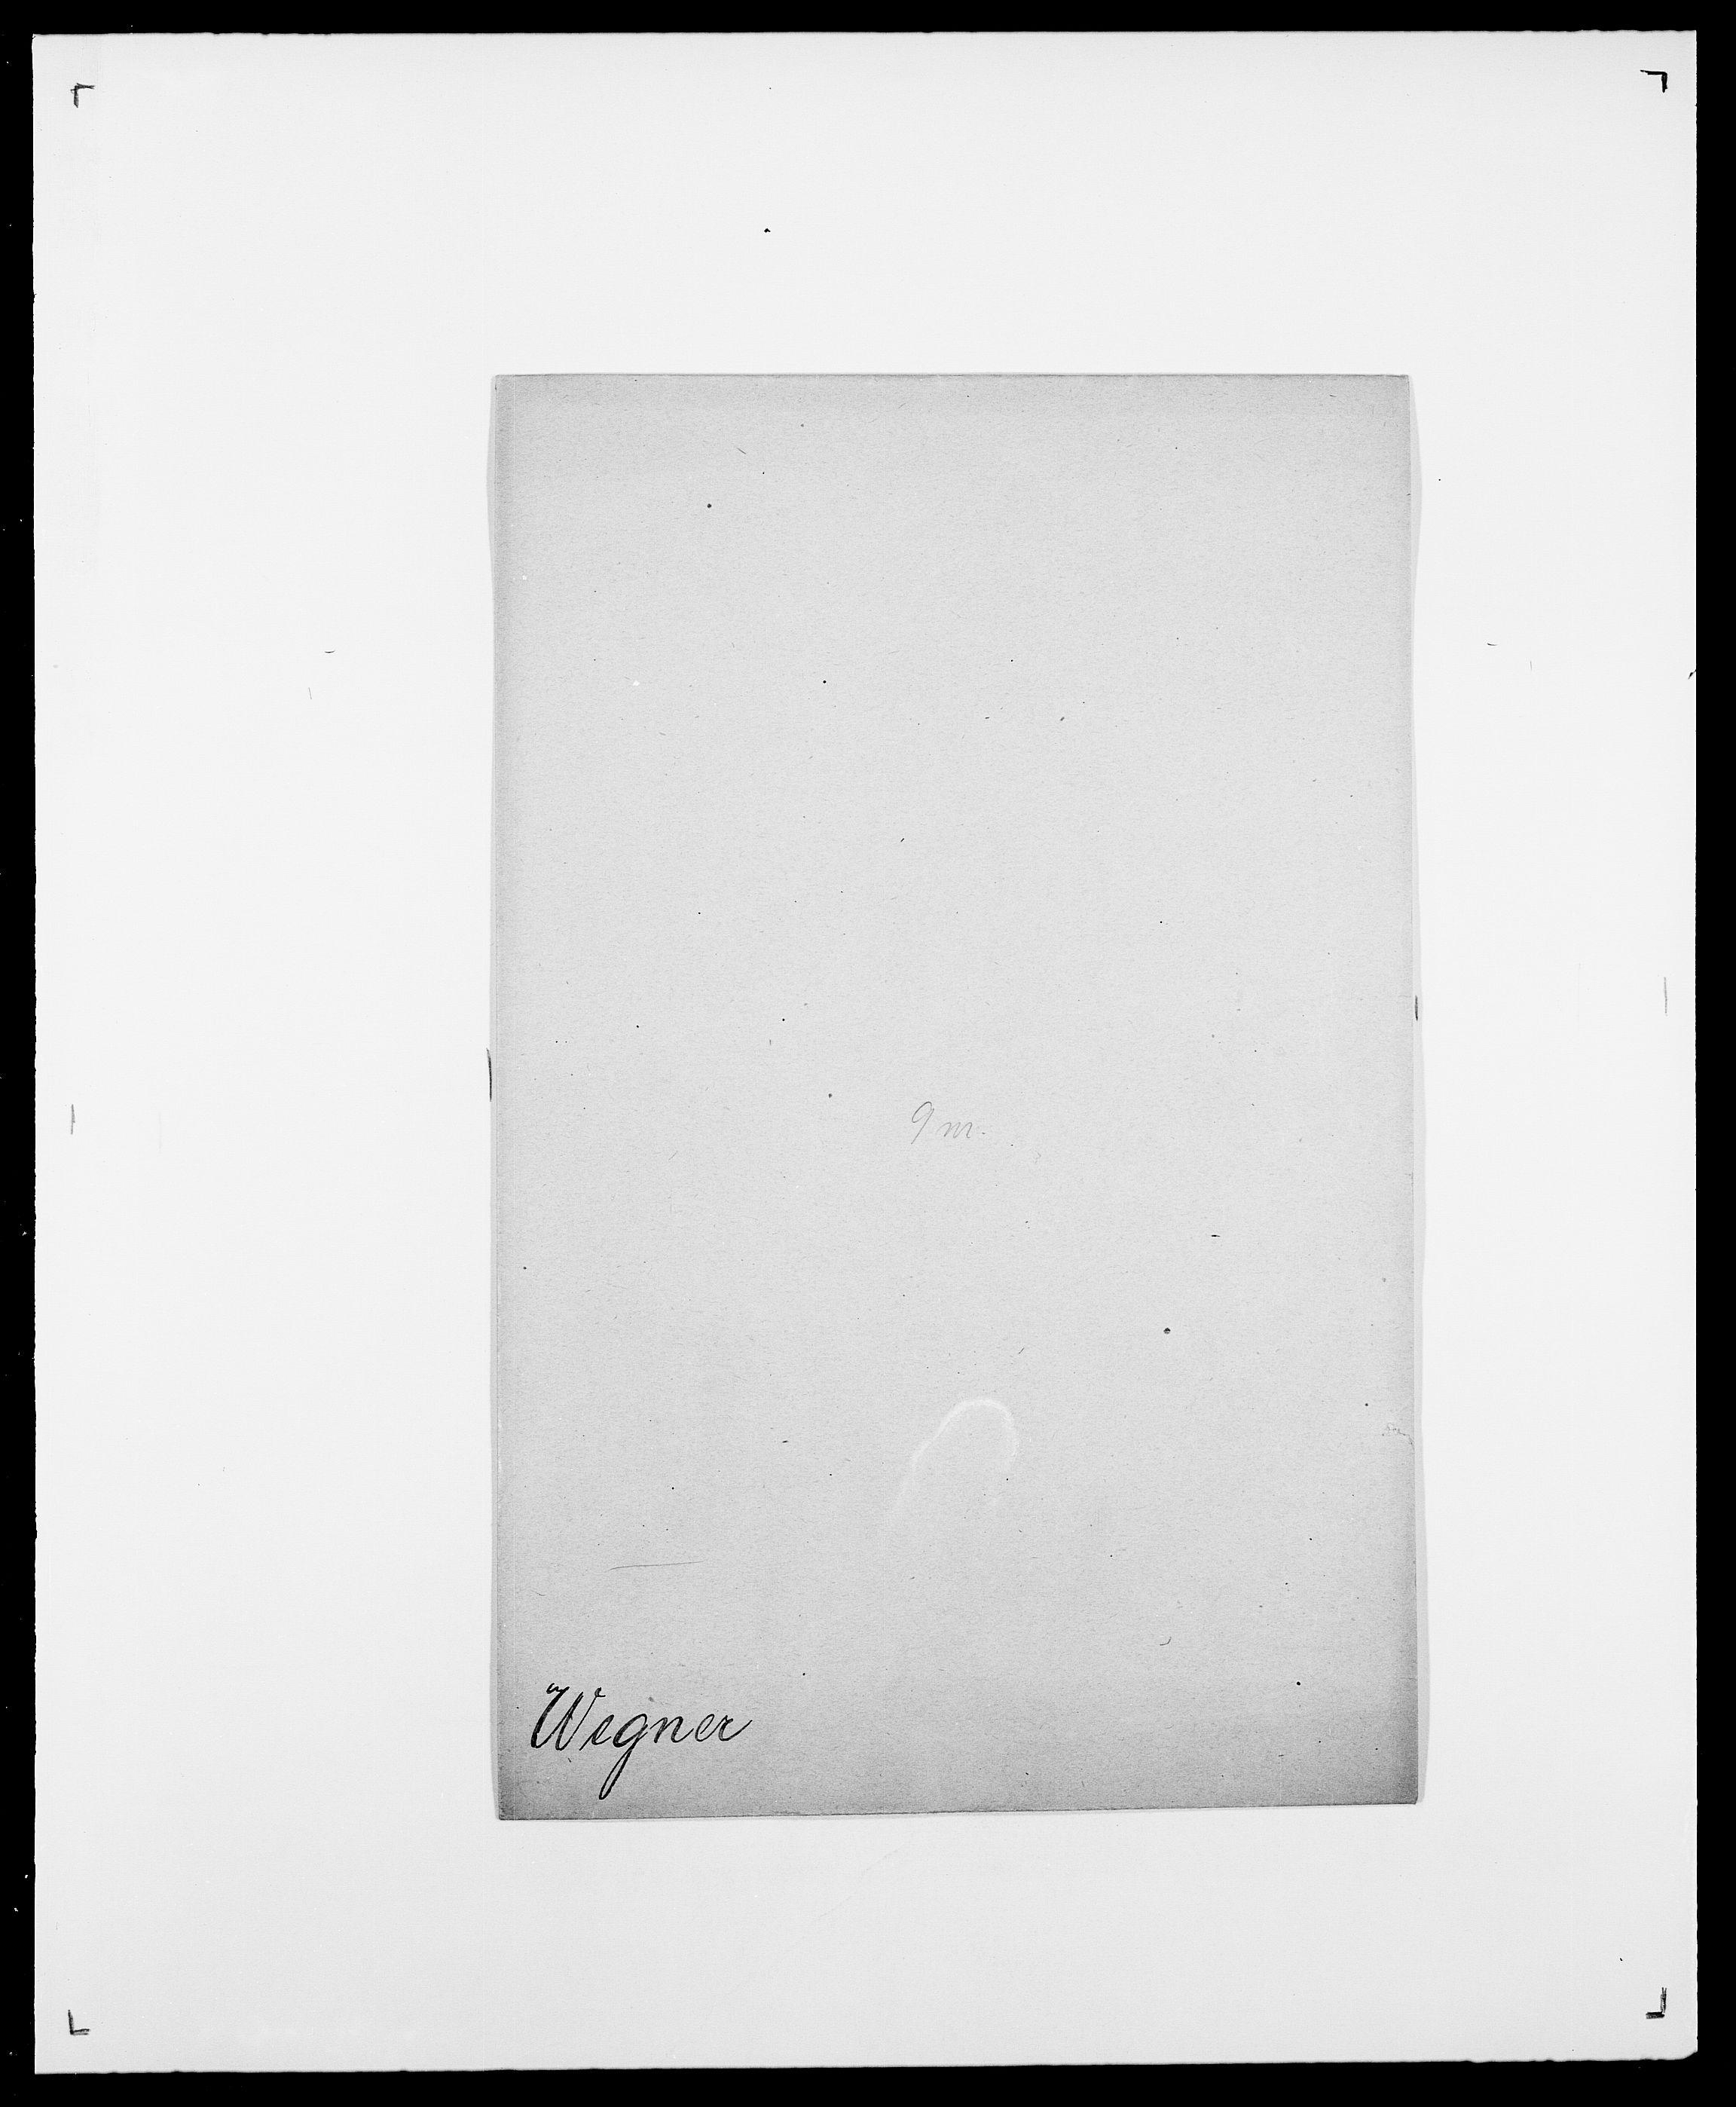 SAO, Delgobe, Charles Antoine - samling, D/Da/L0040: Usgaard - Velund, s. 506